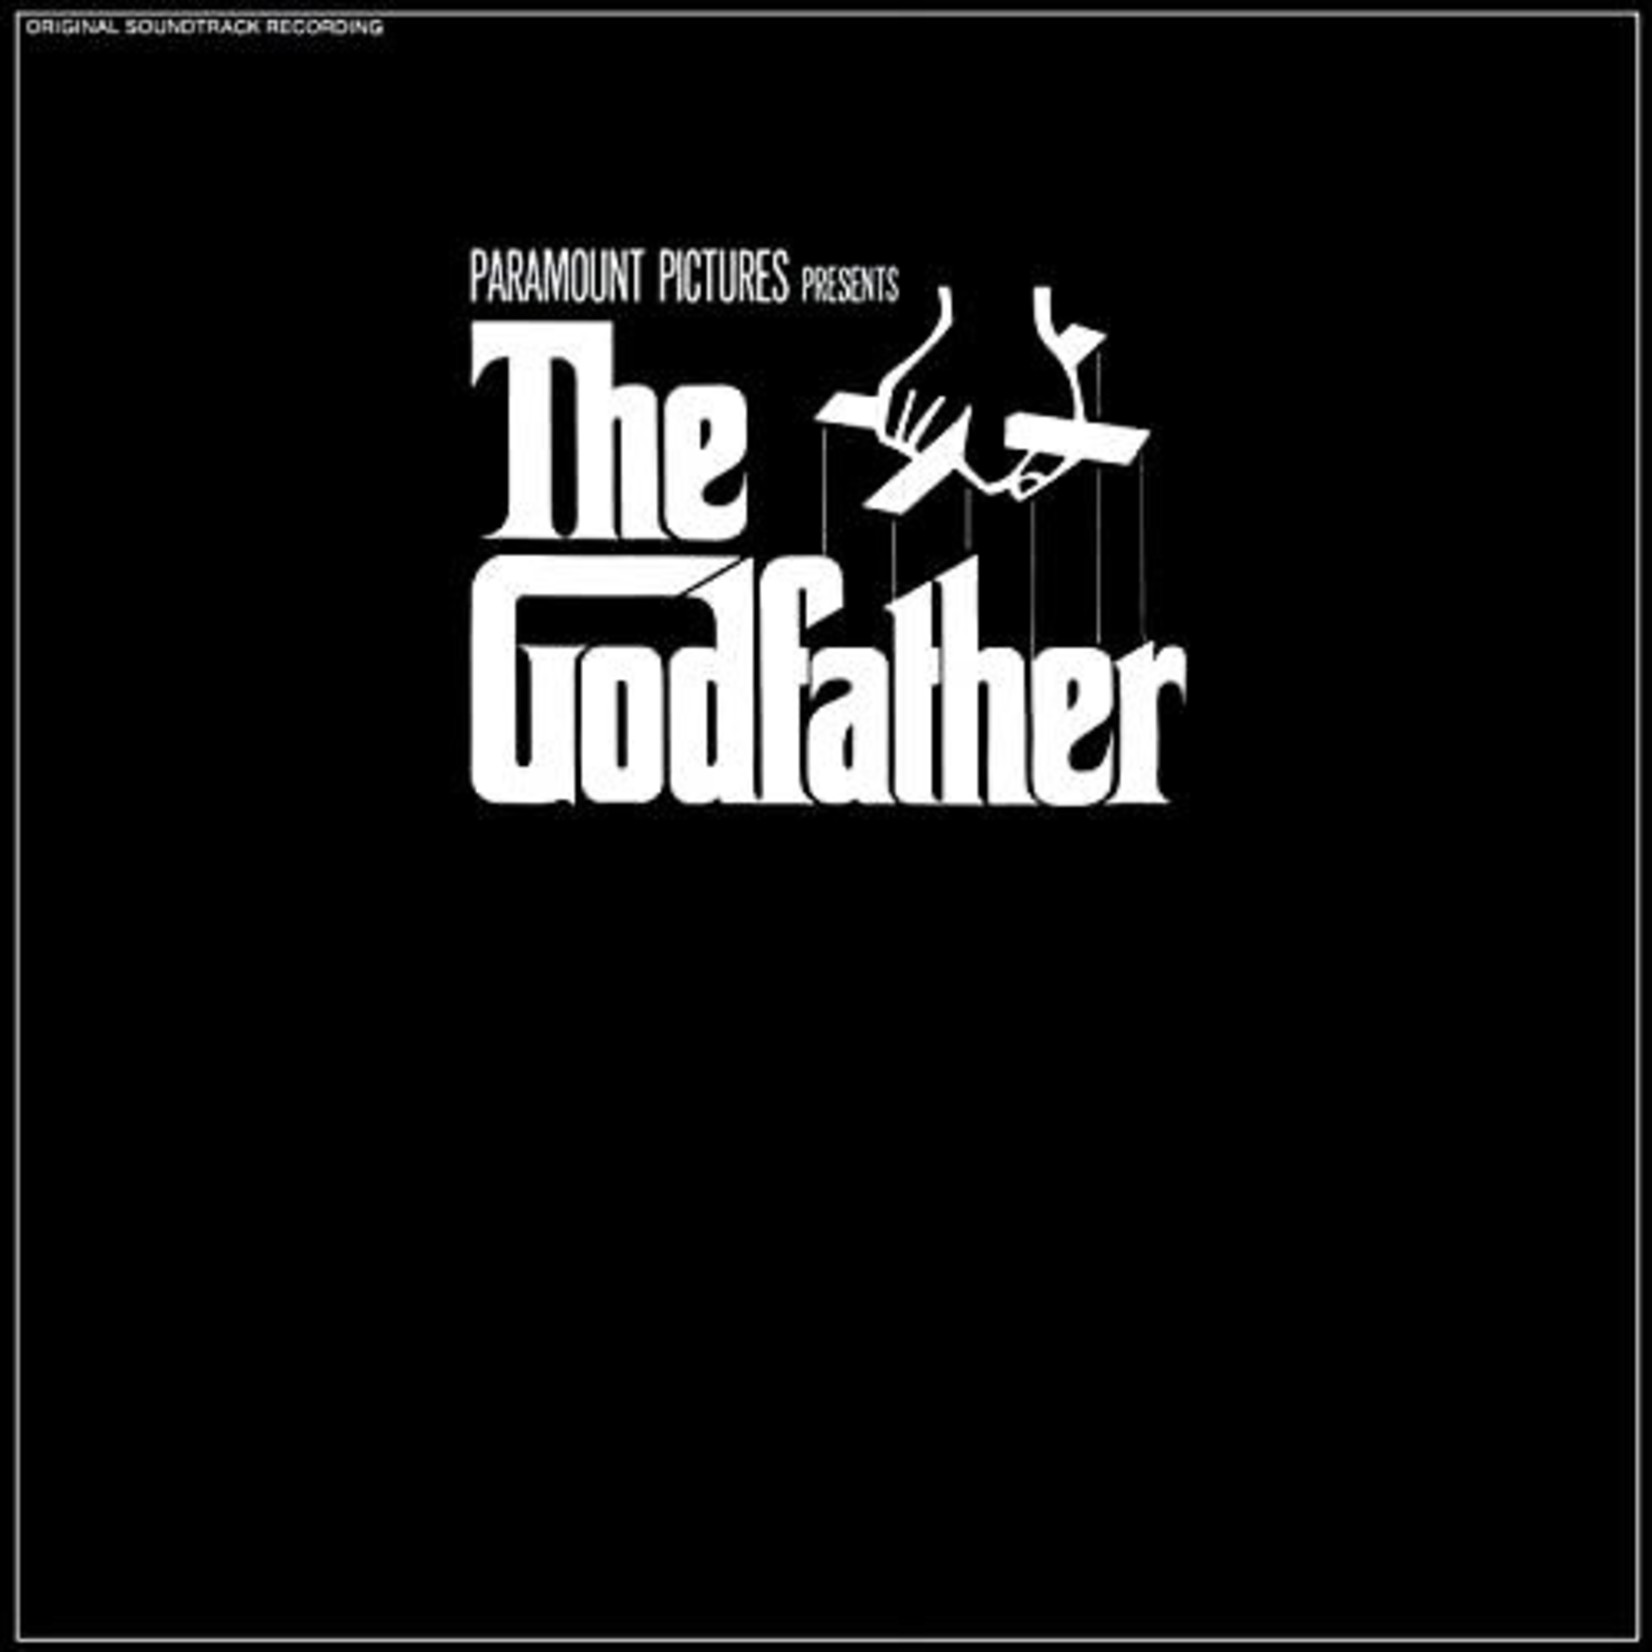 [Vintage] Rota, Nino: The Godfather (Soundtrack)